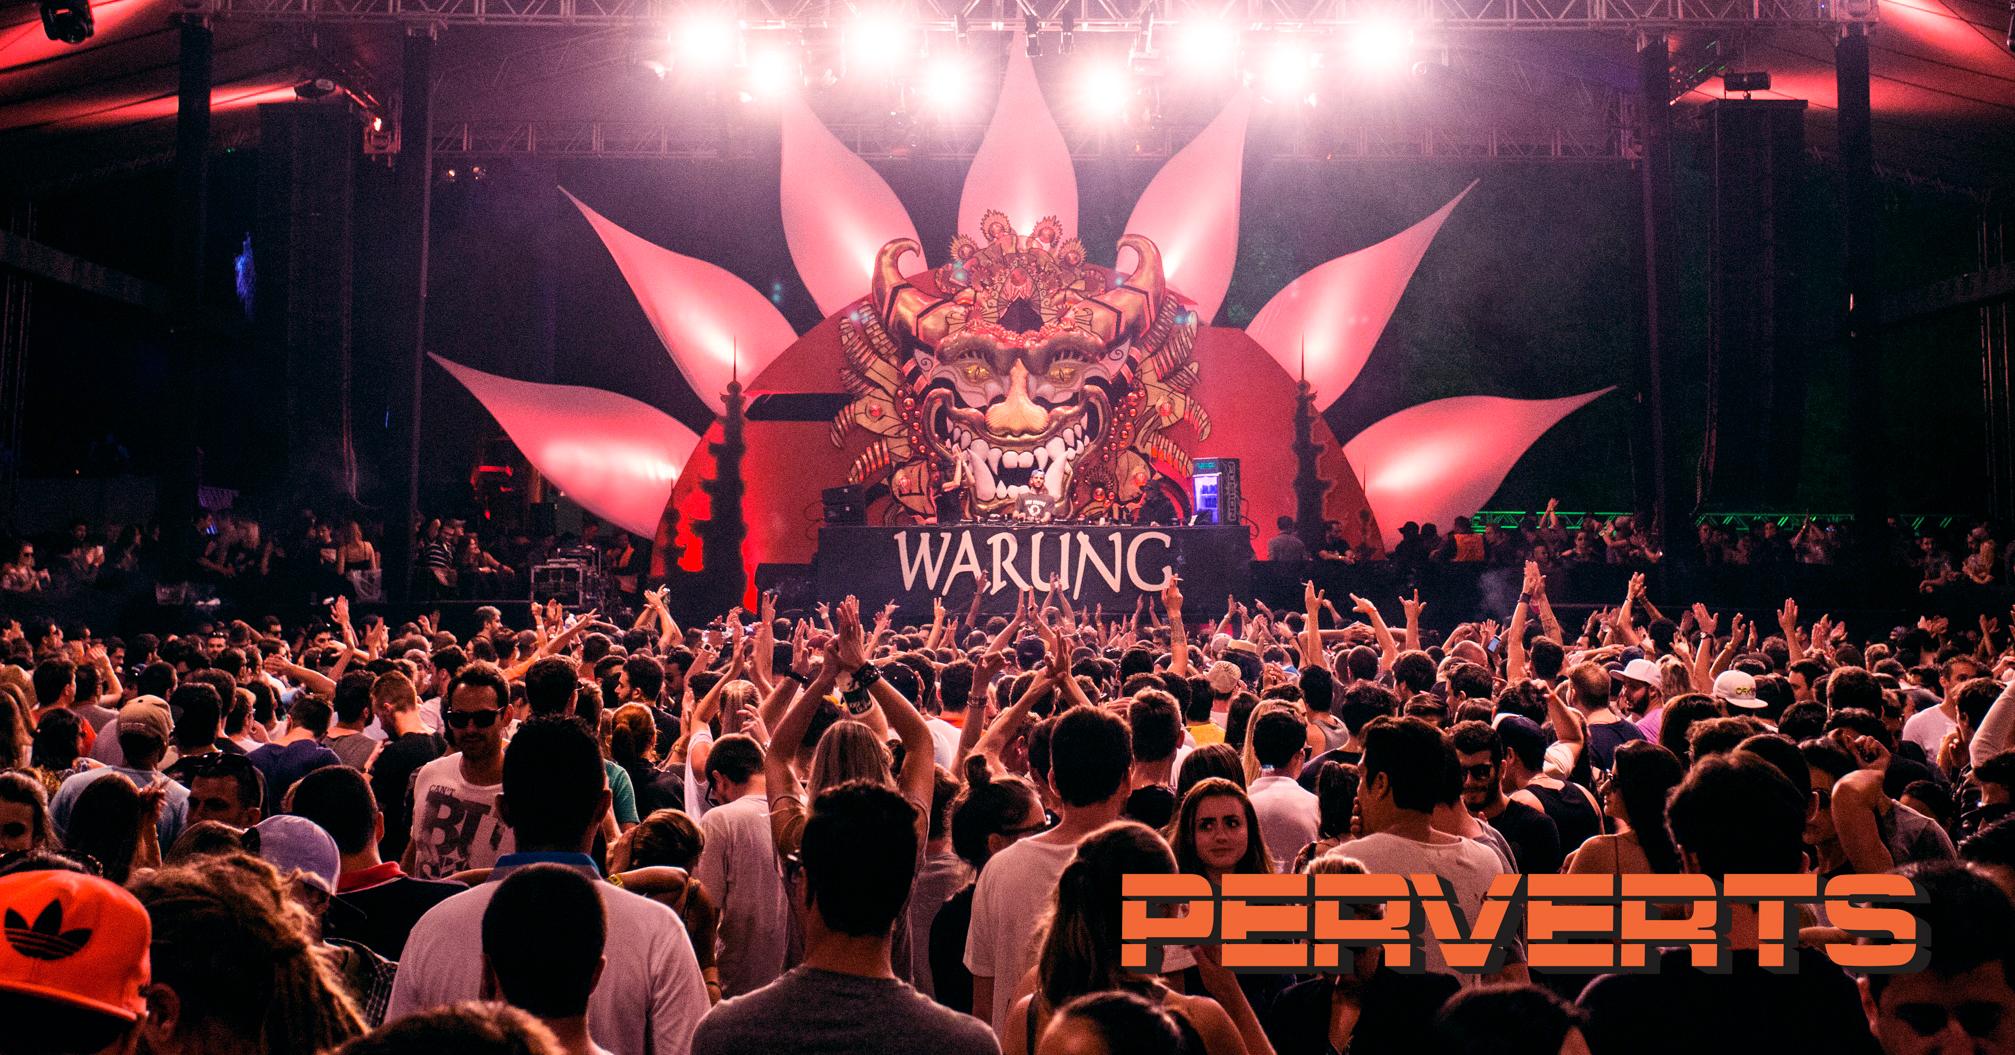 Warung Day Festival  . 21 de março de 2015, na Pedreira Paulo Leminski.  . cenografia: Perverts . fotografia © Rubens Nemitz Jr